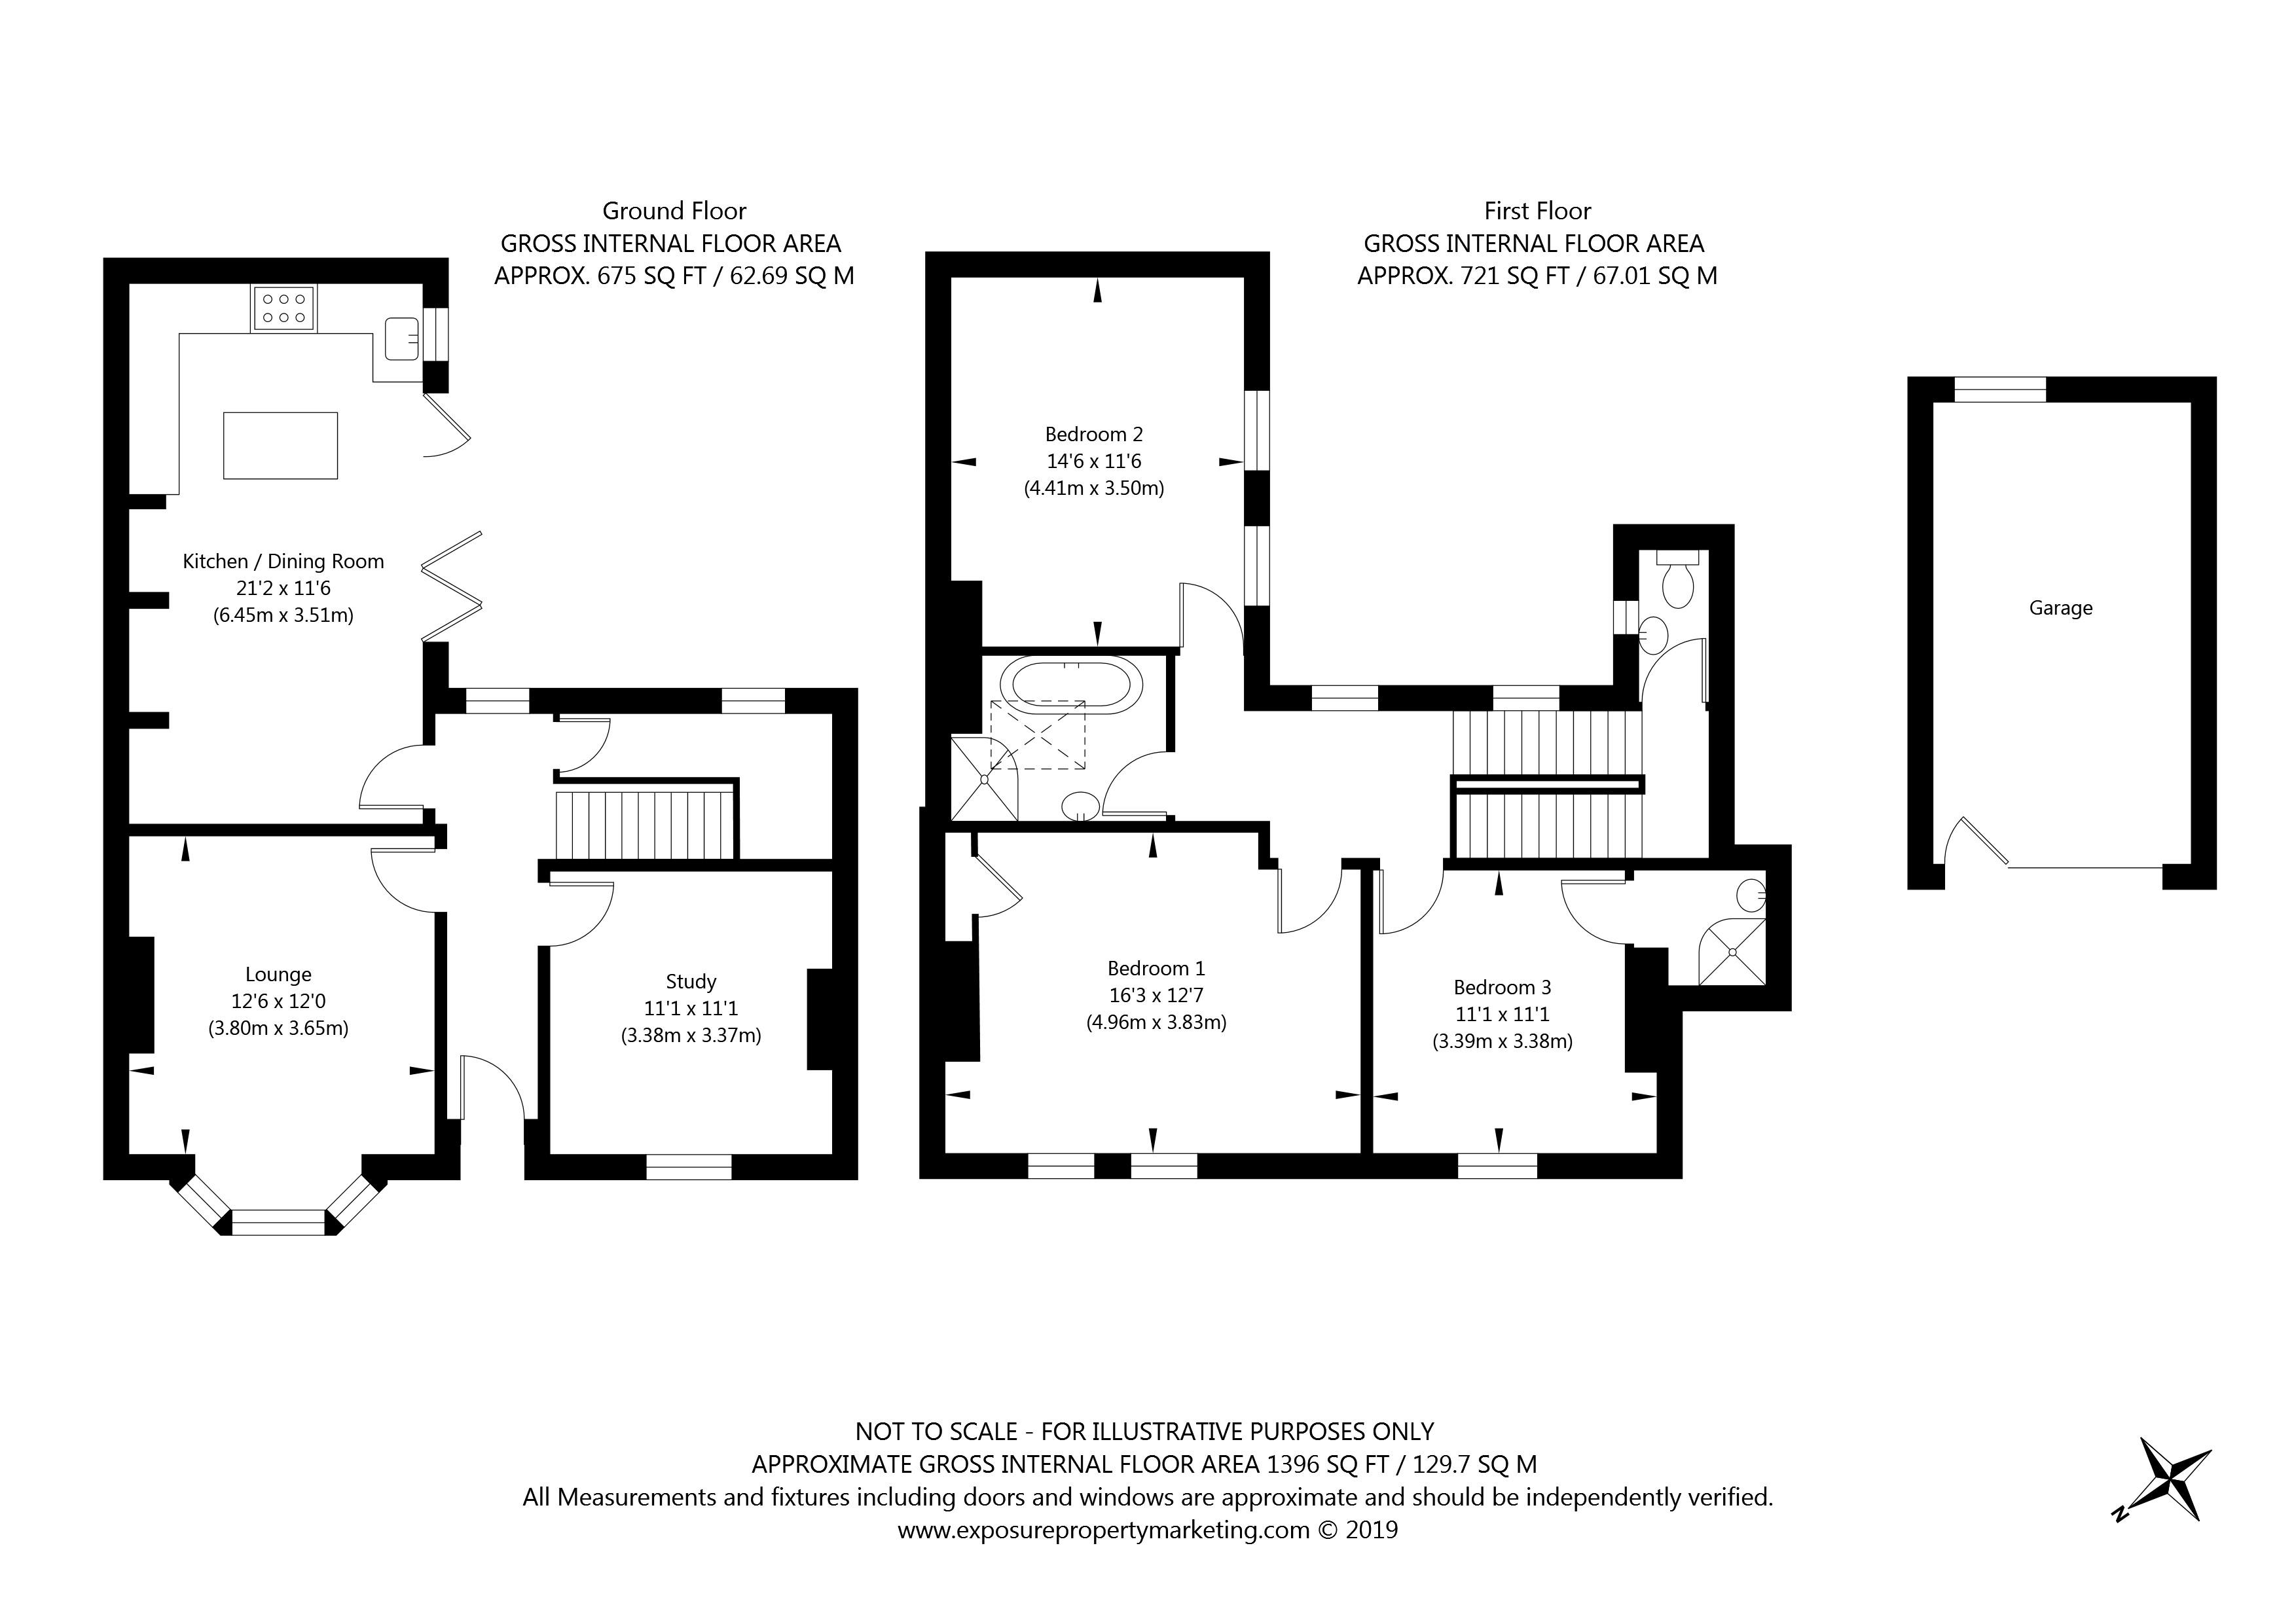 28 Bootham Crescent, York property floorplan